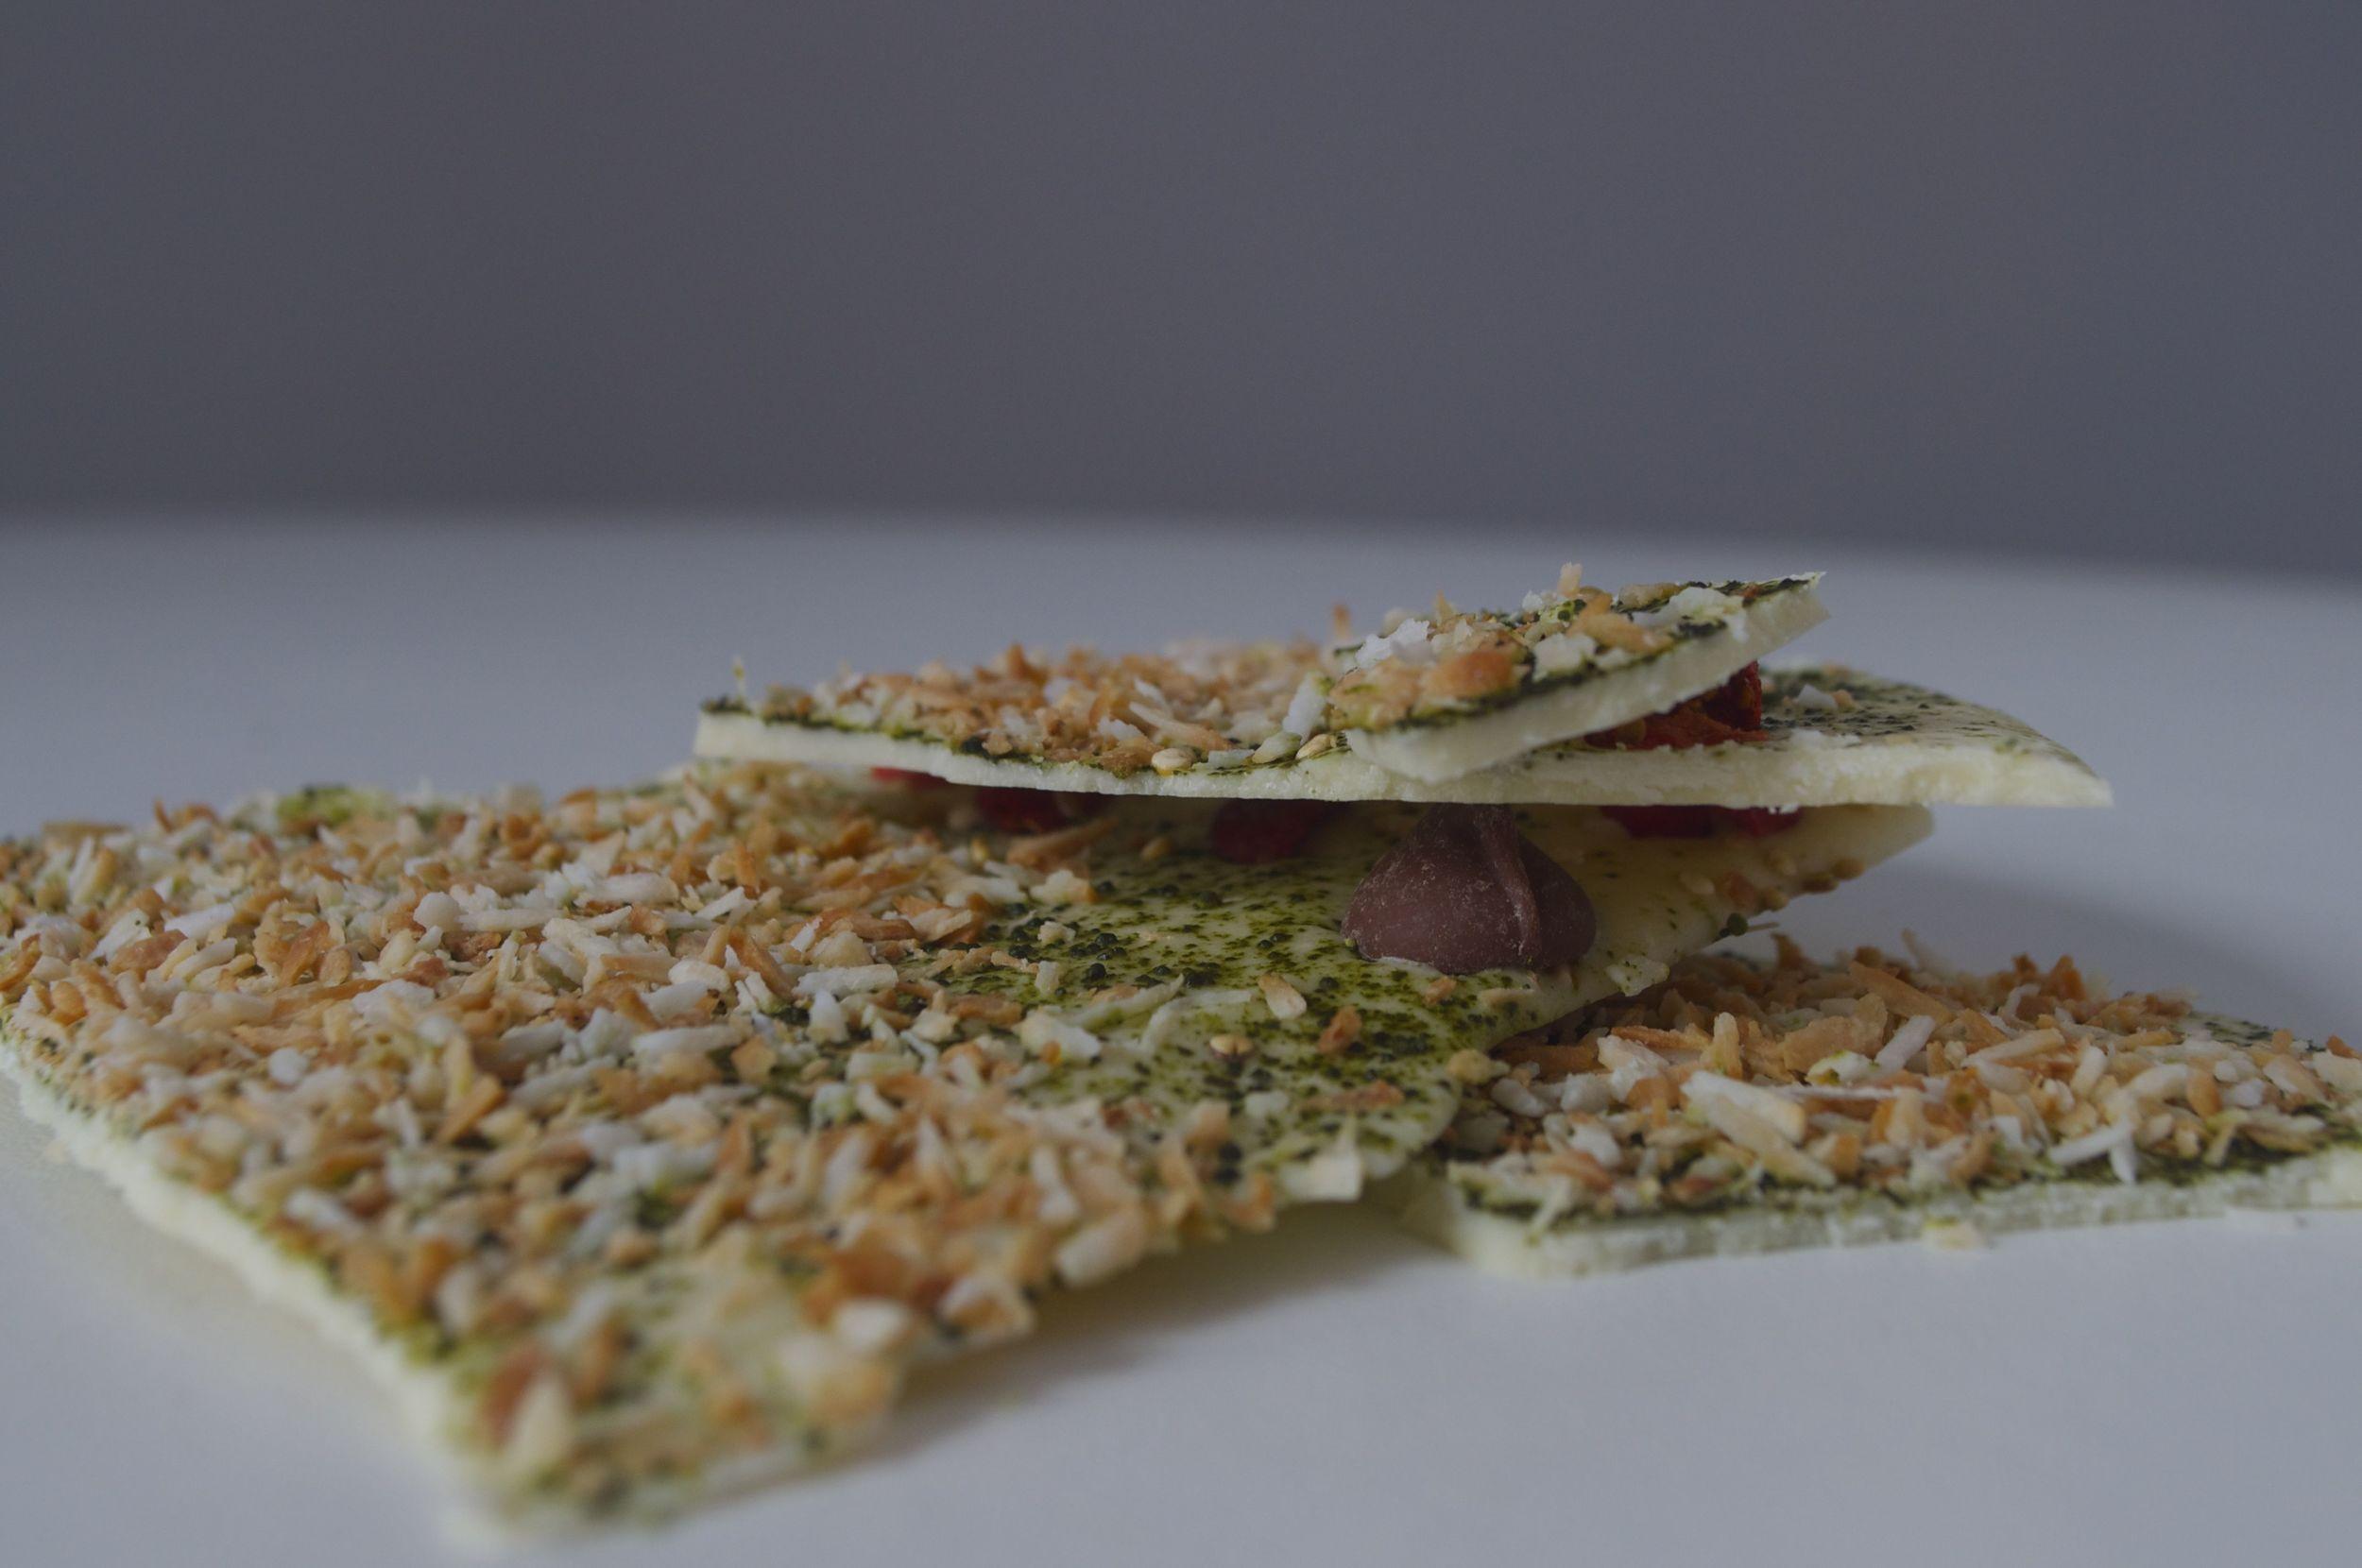 matcha-coconut-chocolate-bark-fried-parsley